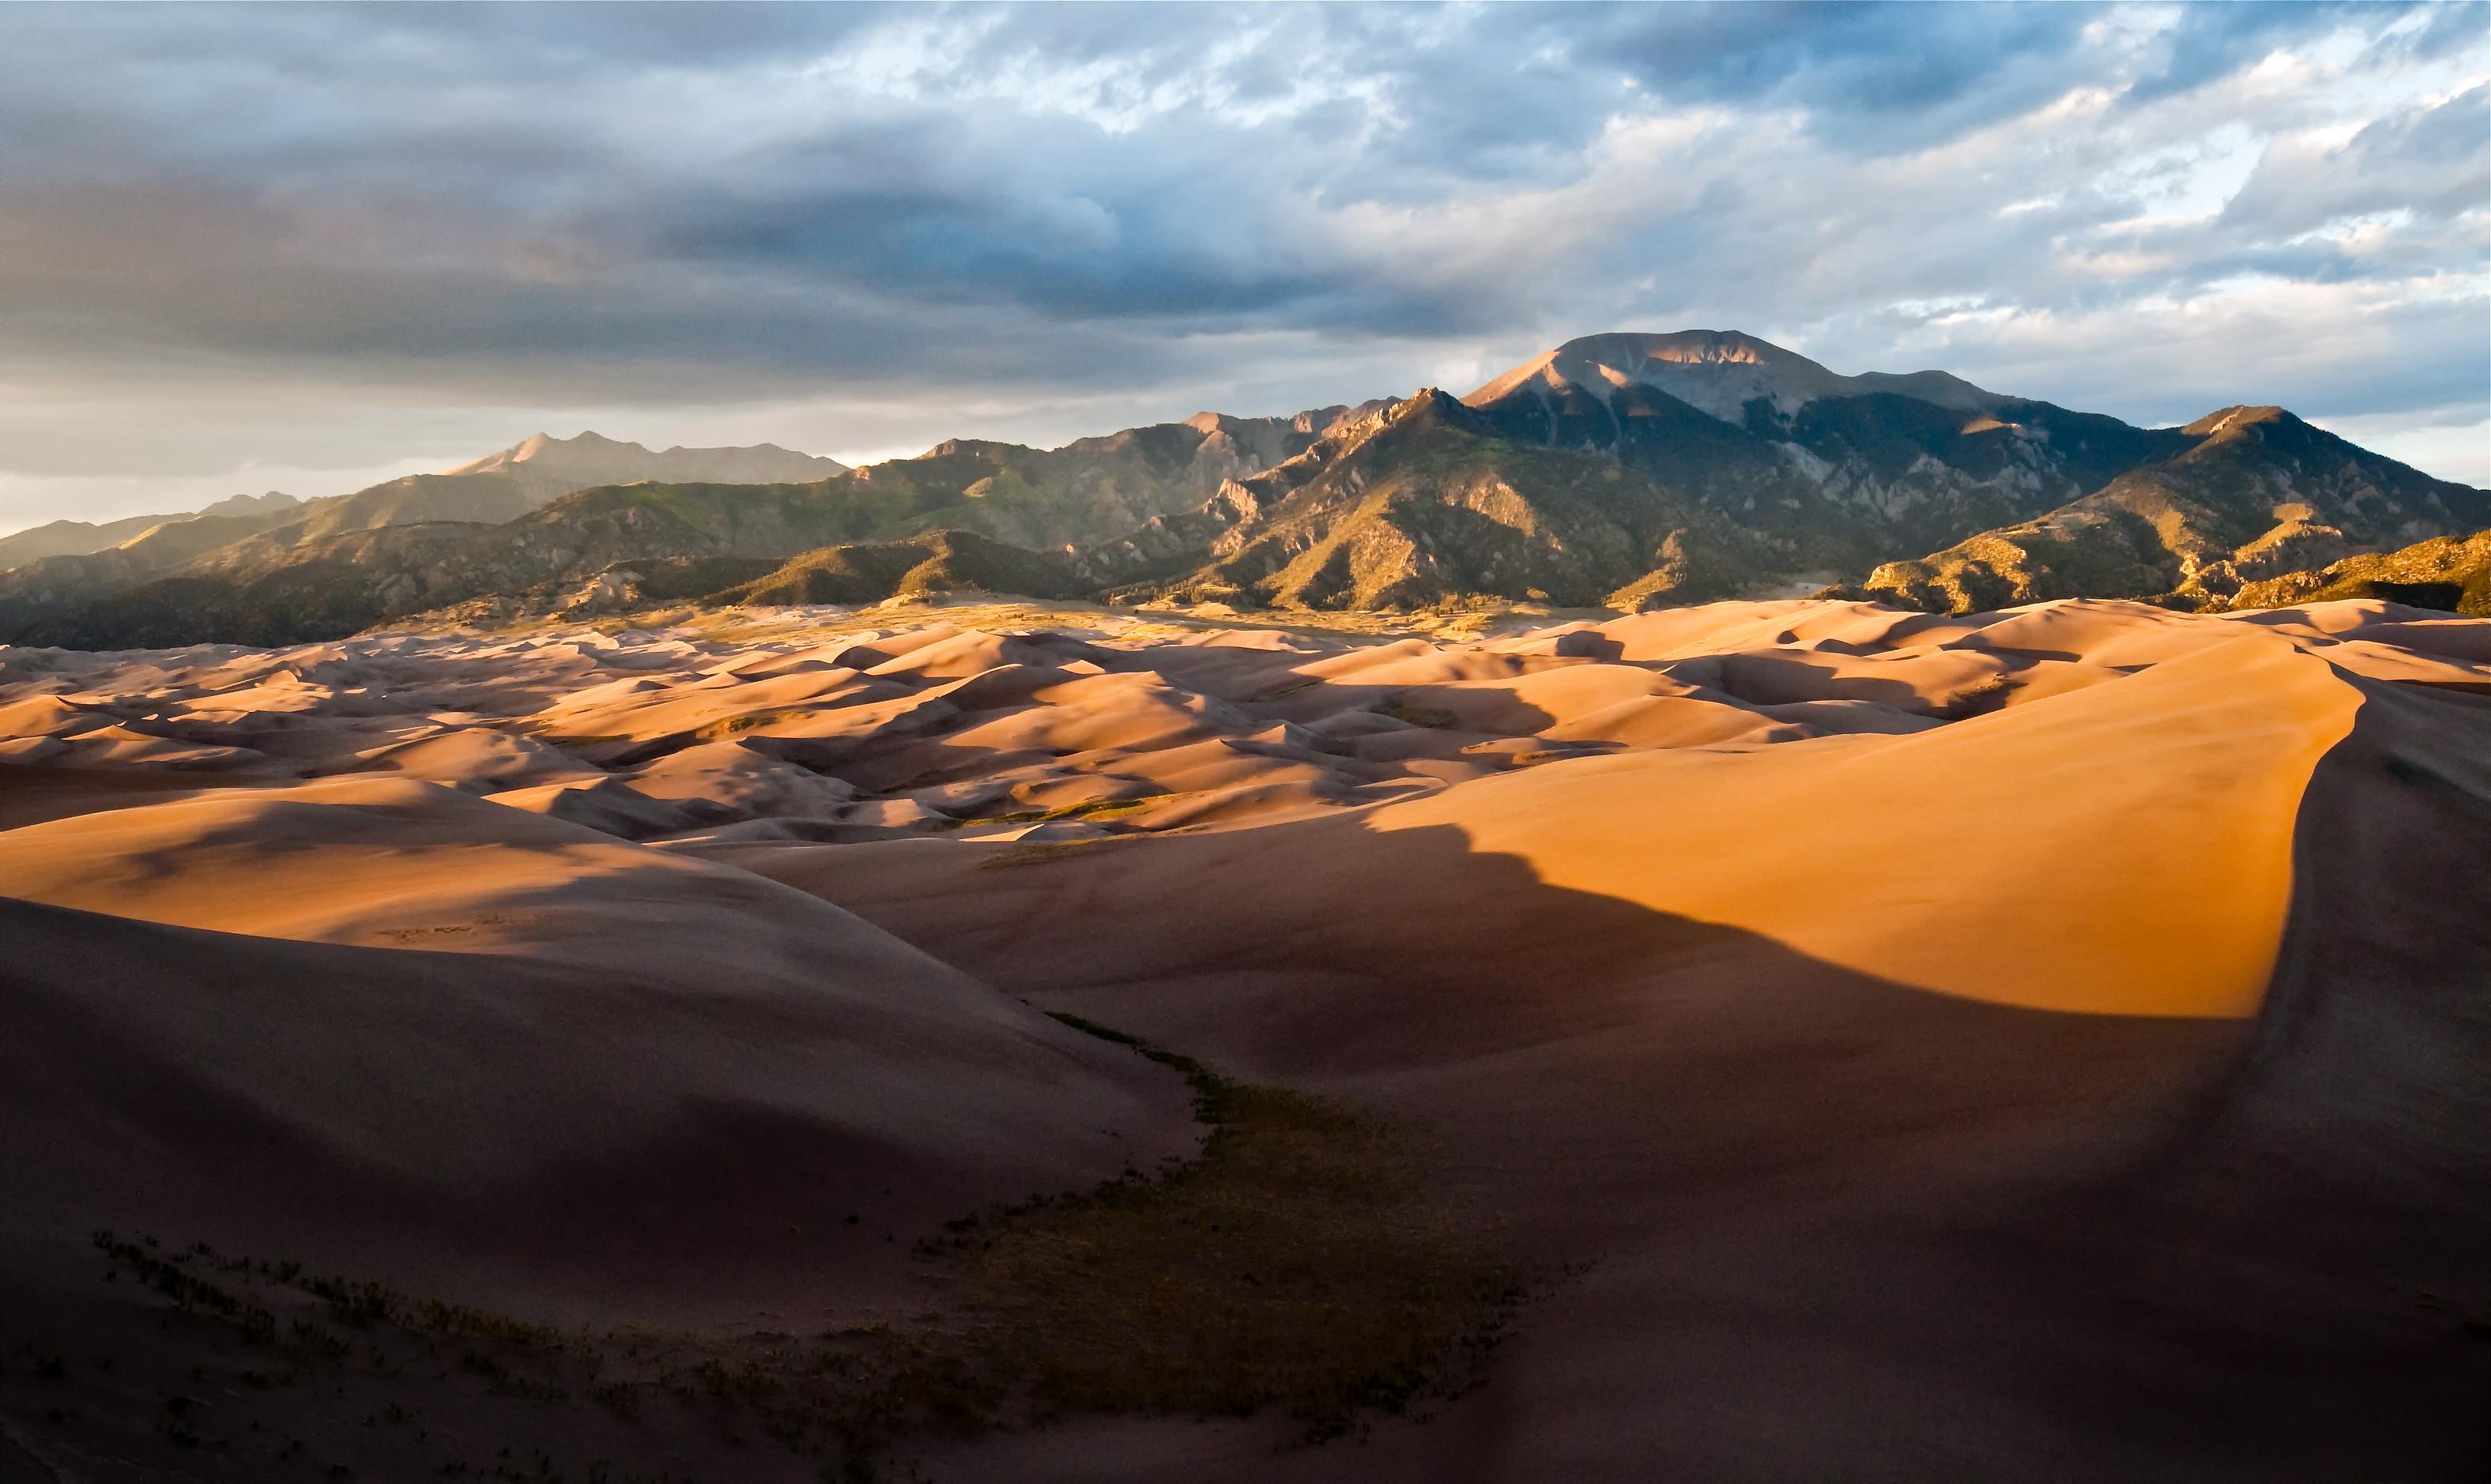 Sand Dunes-0189-Edit-45-3152x2016